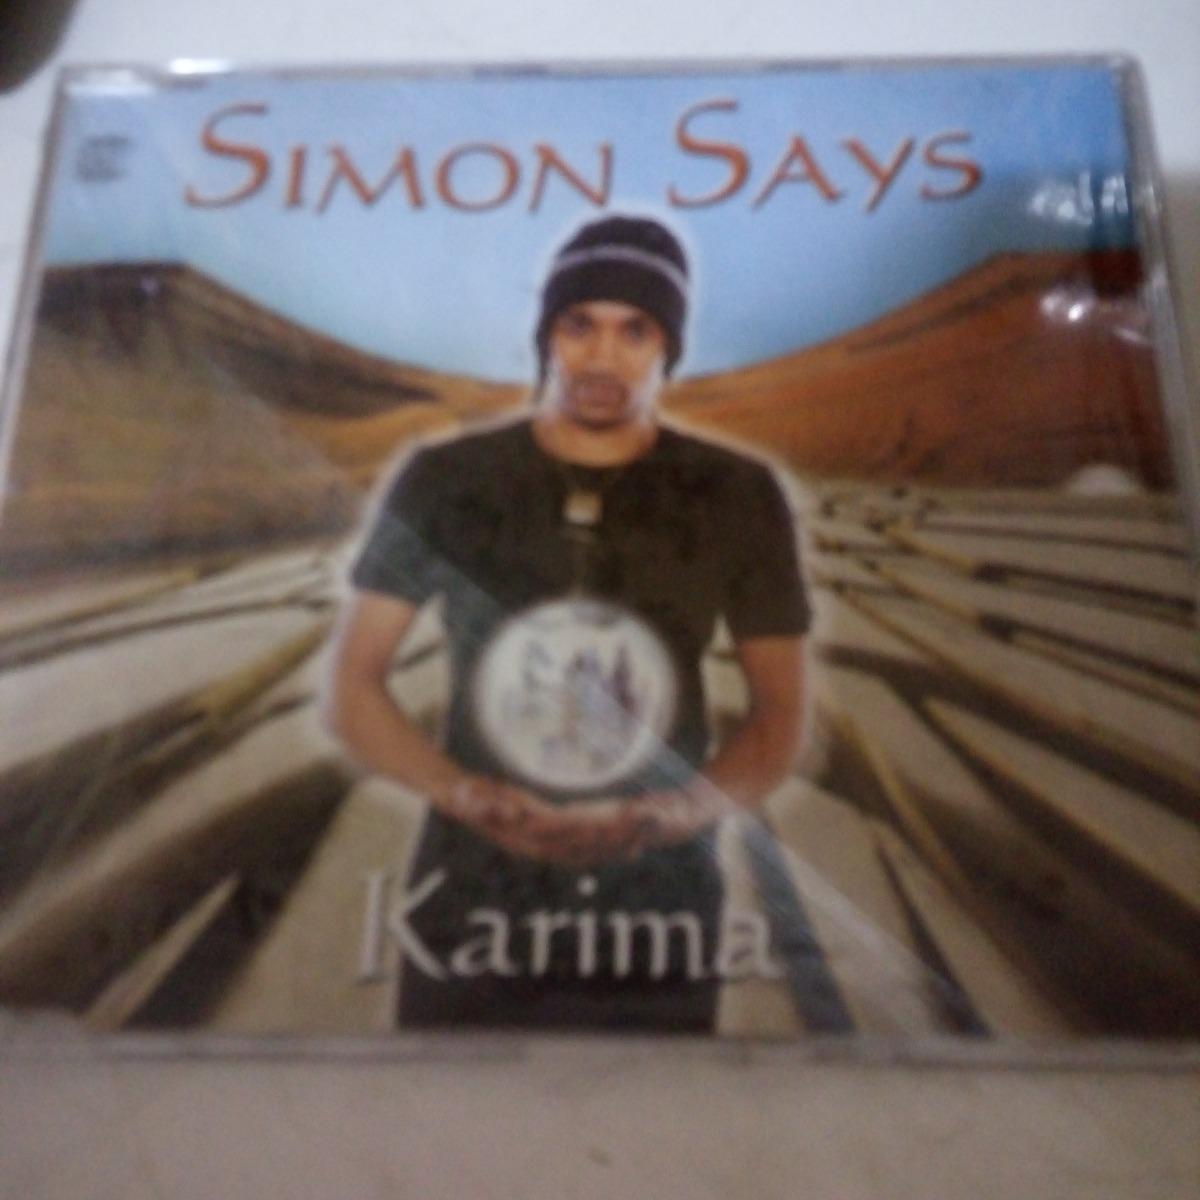 simon says karima